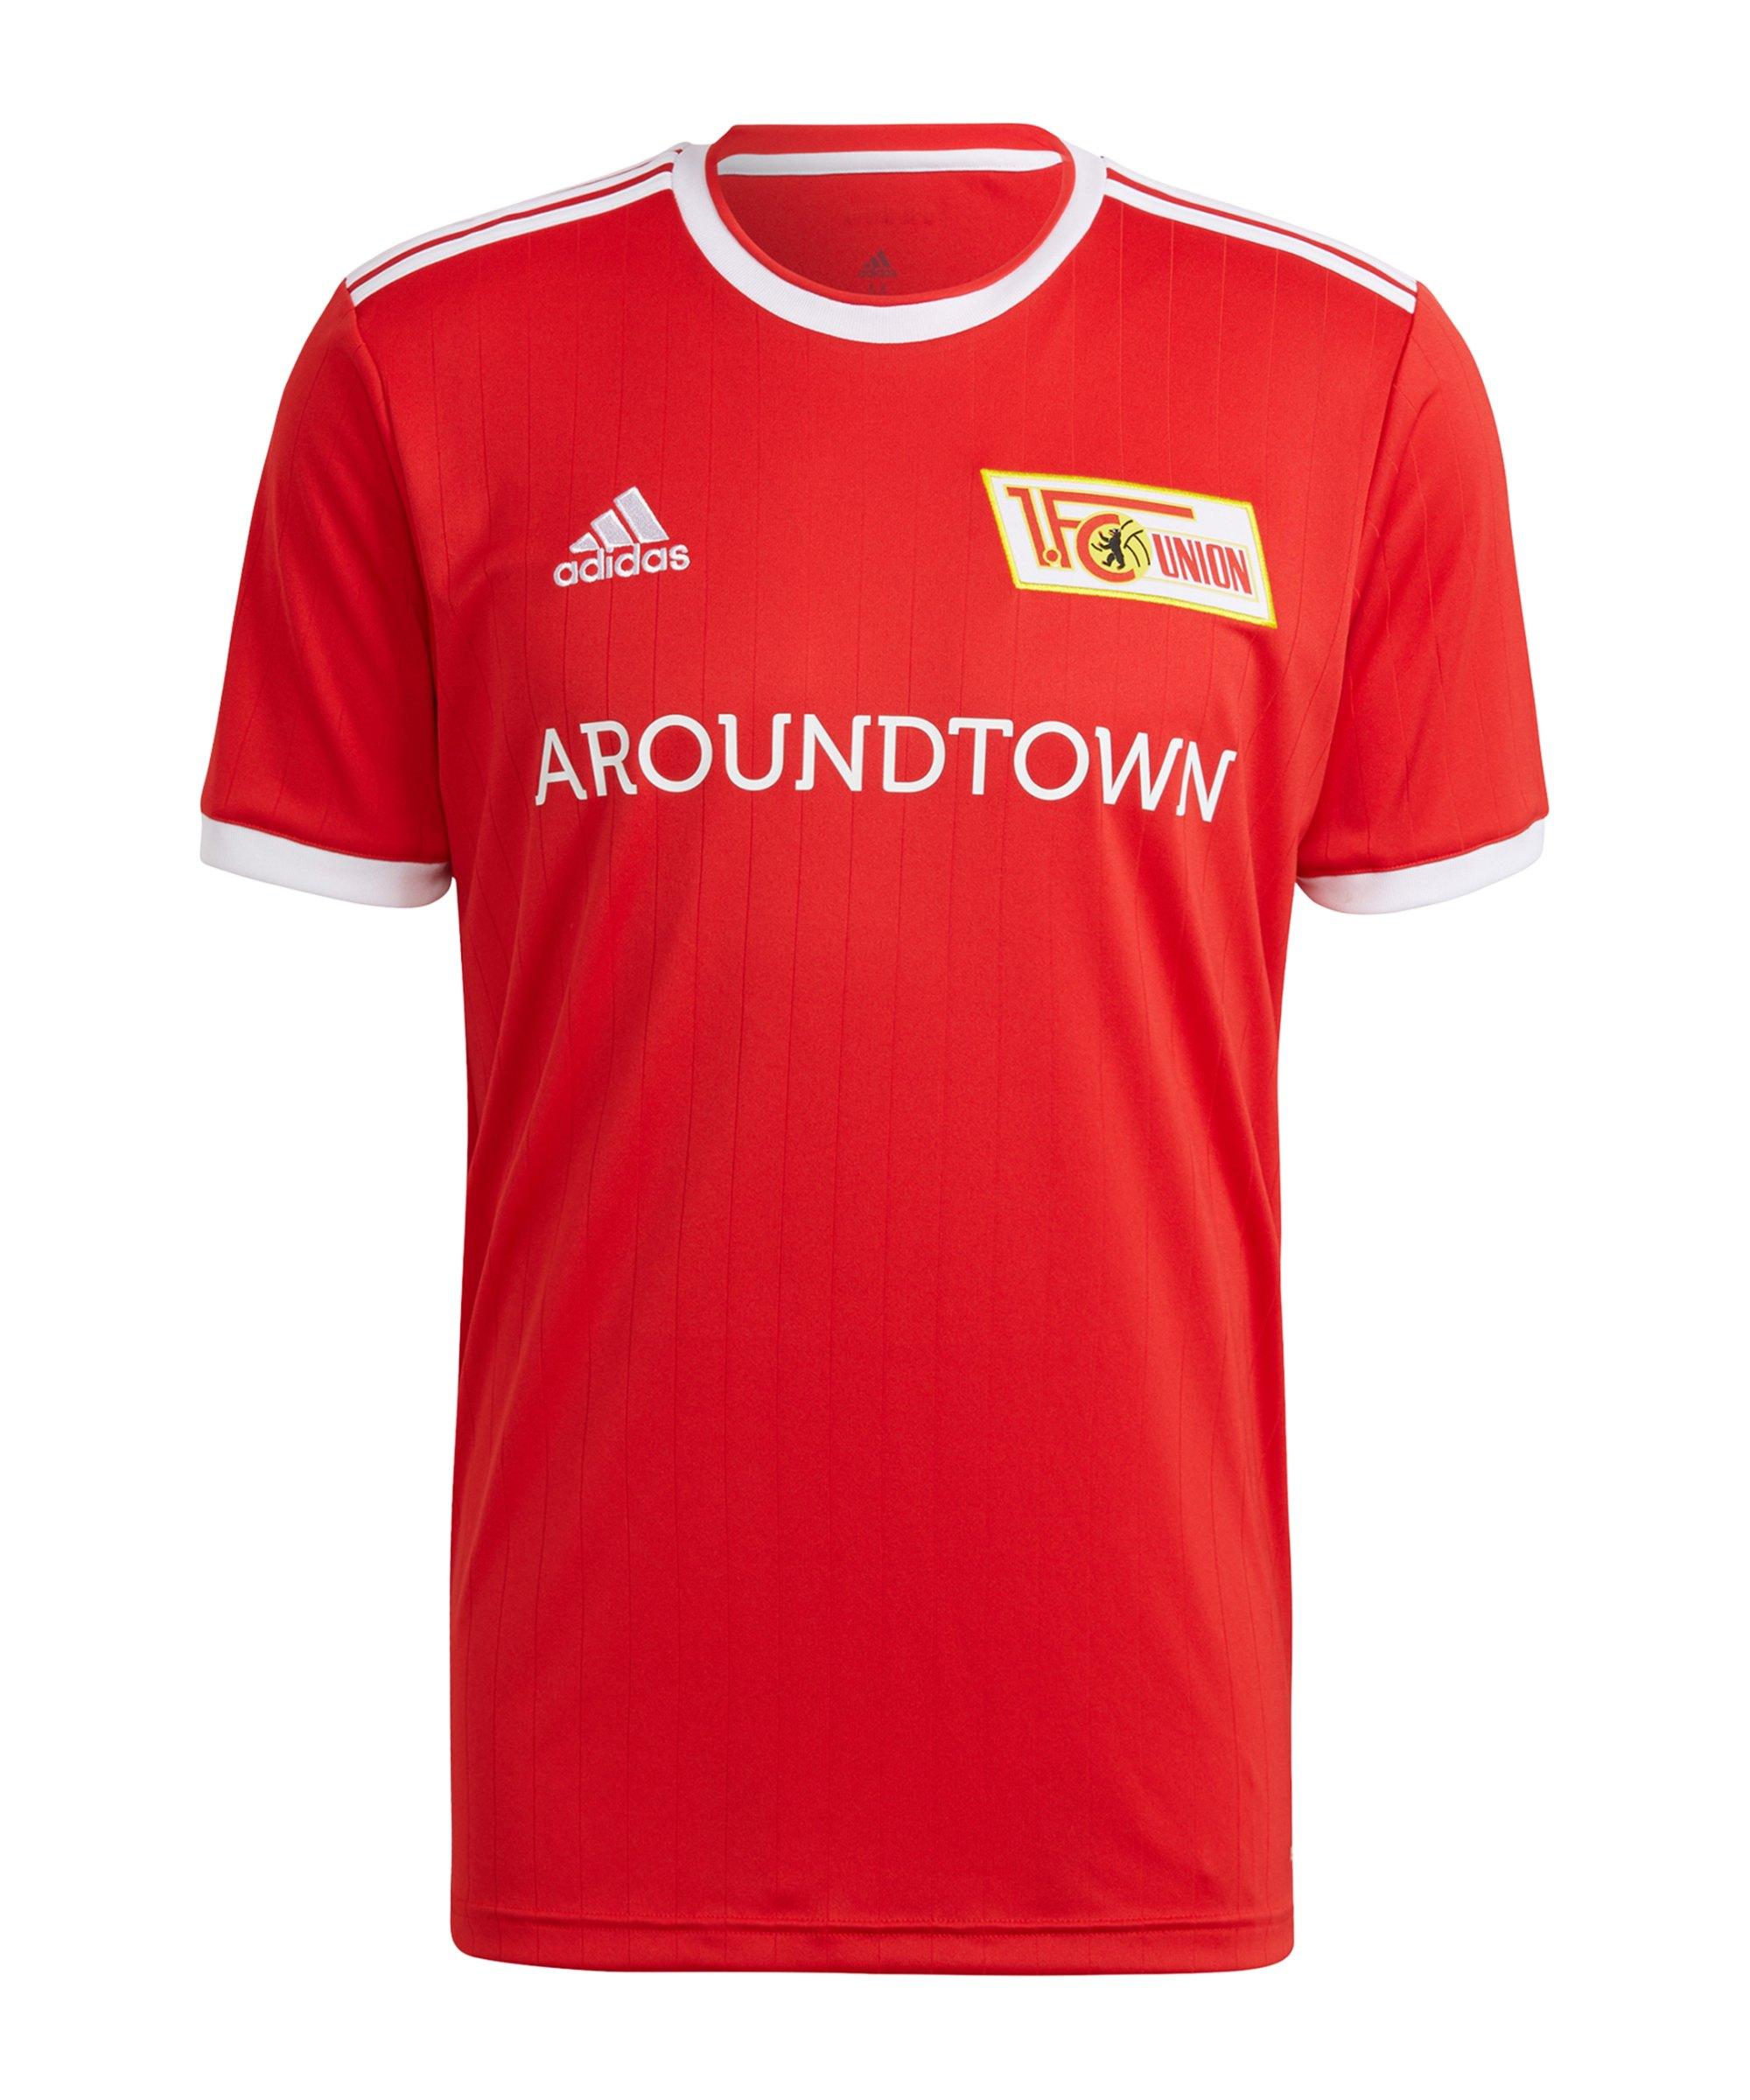 adidas 1. FC Union Berlin Trikot Home 2021/2022 Damen Rot - rot